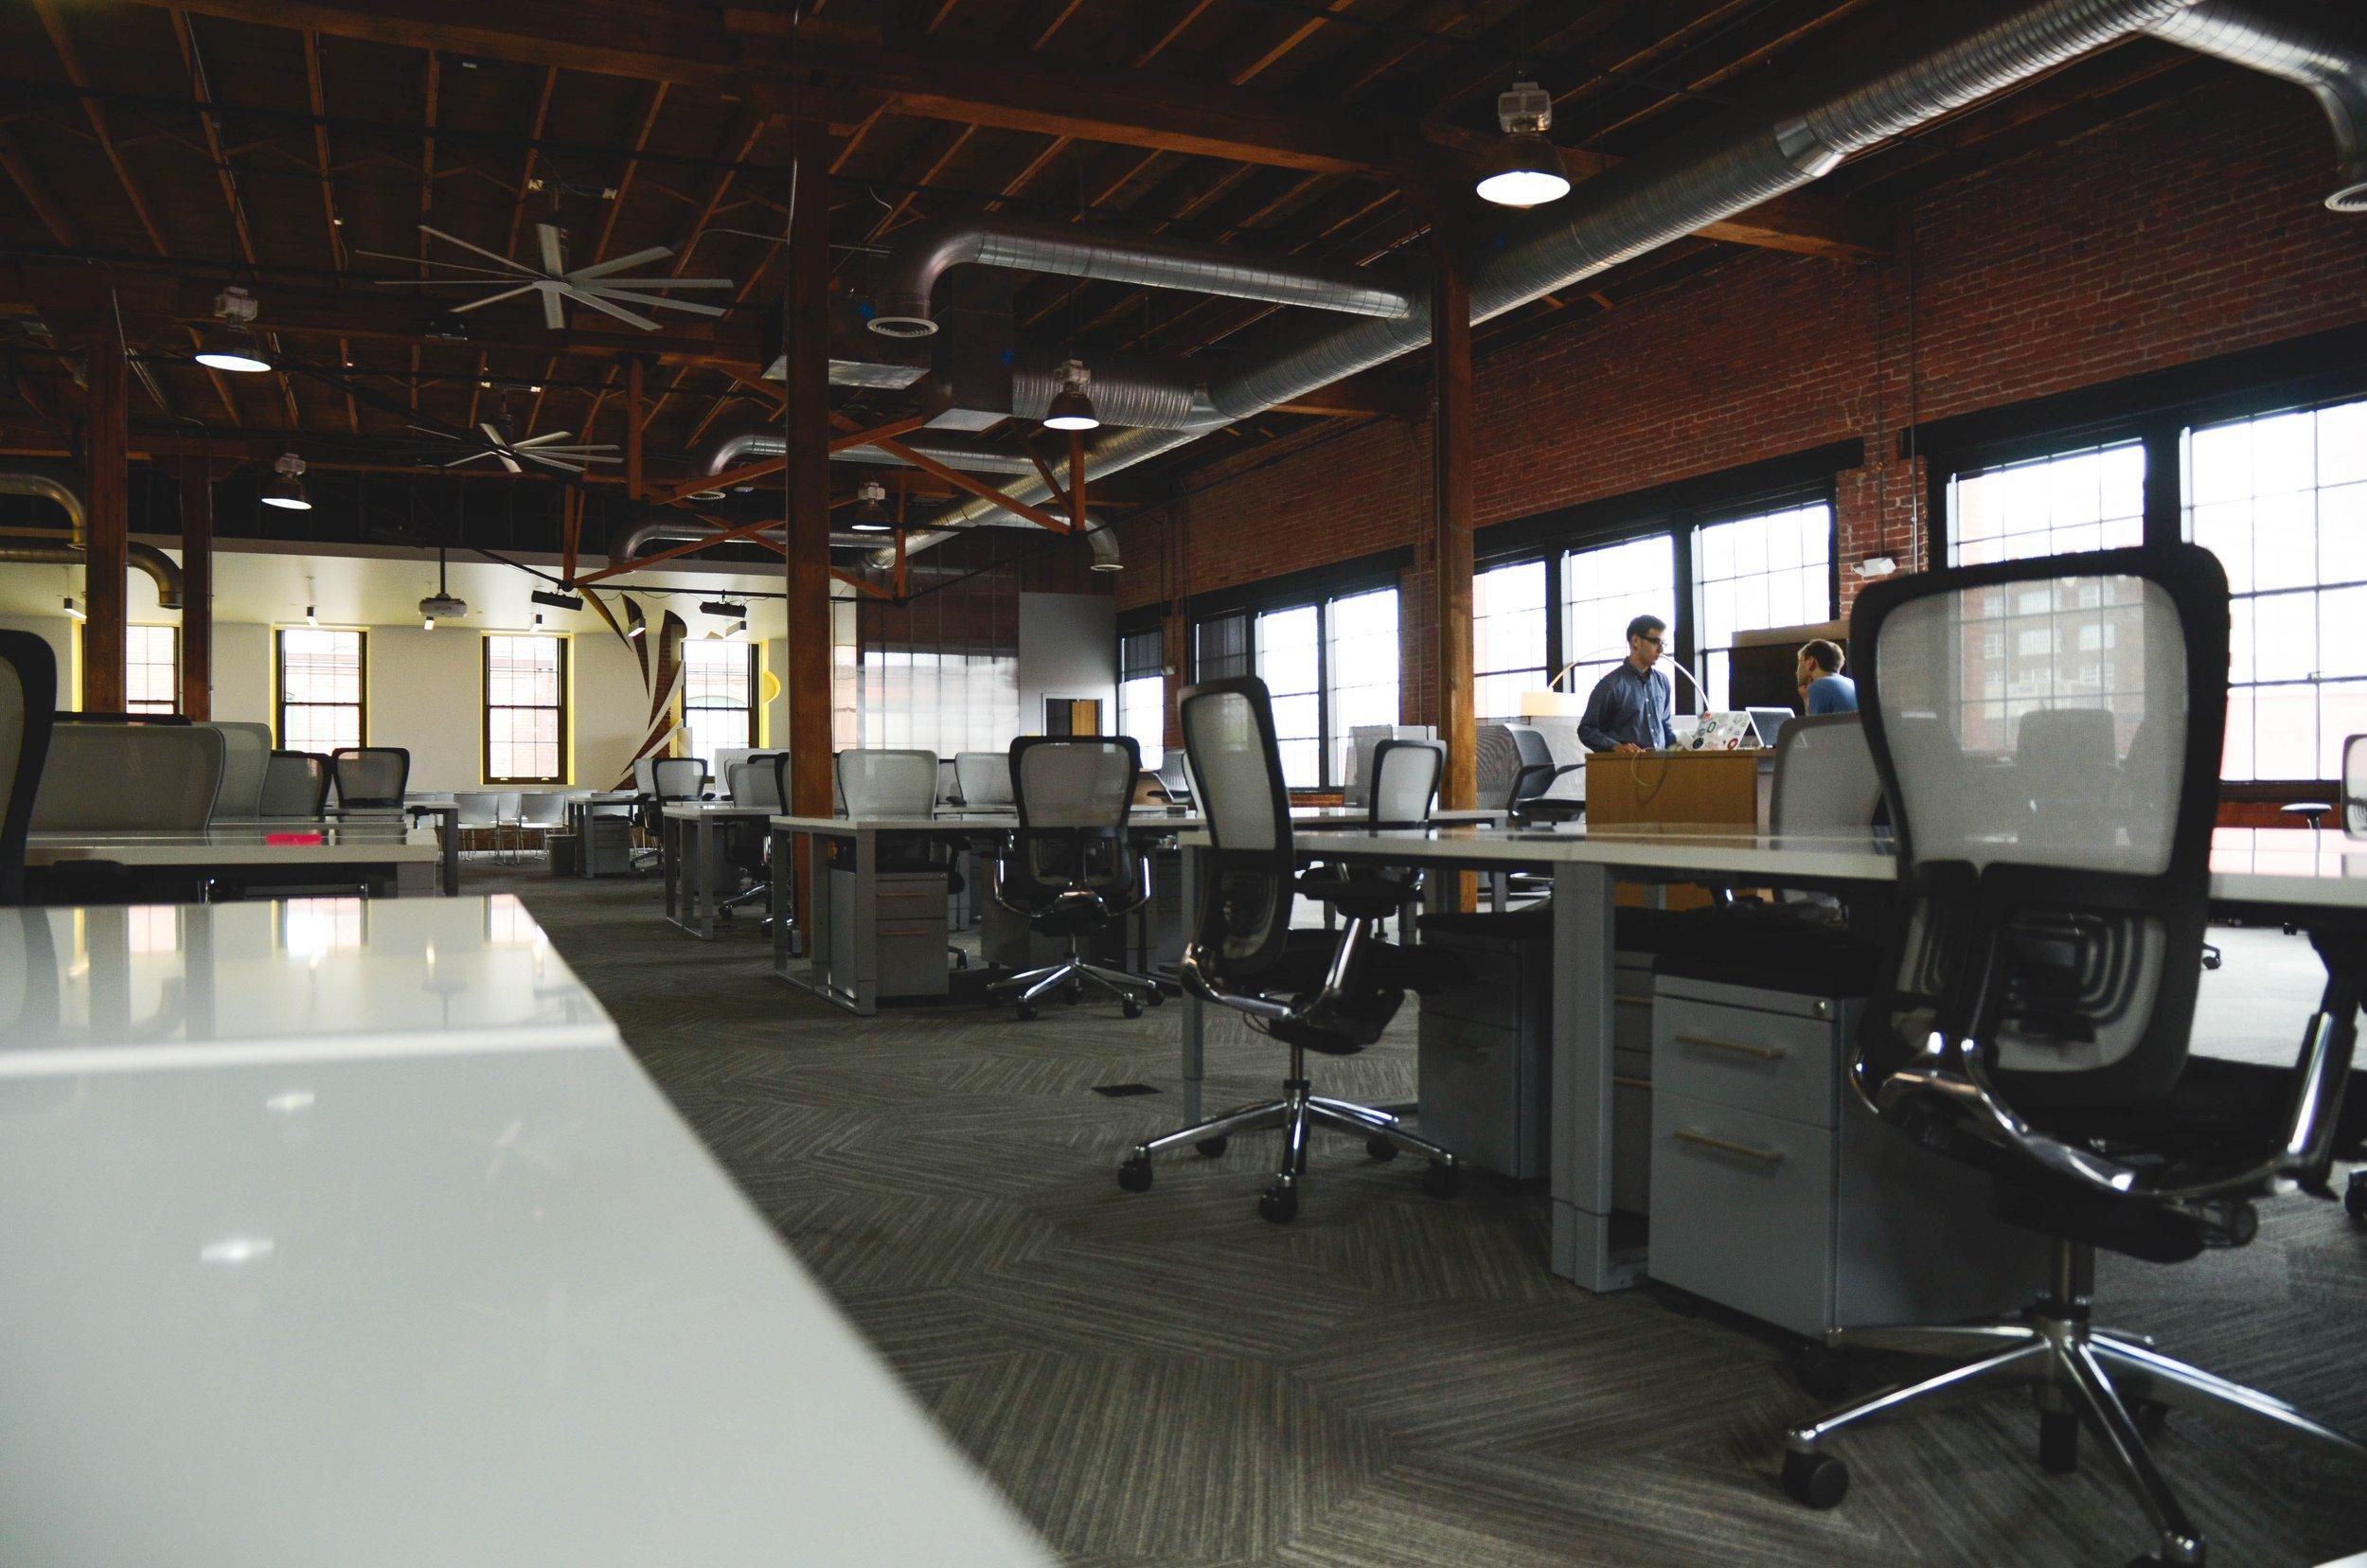 Image credit: https://www.pexels.com/@startup-stock-photos